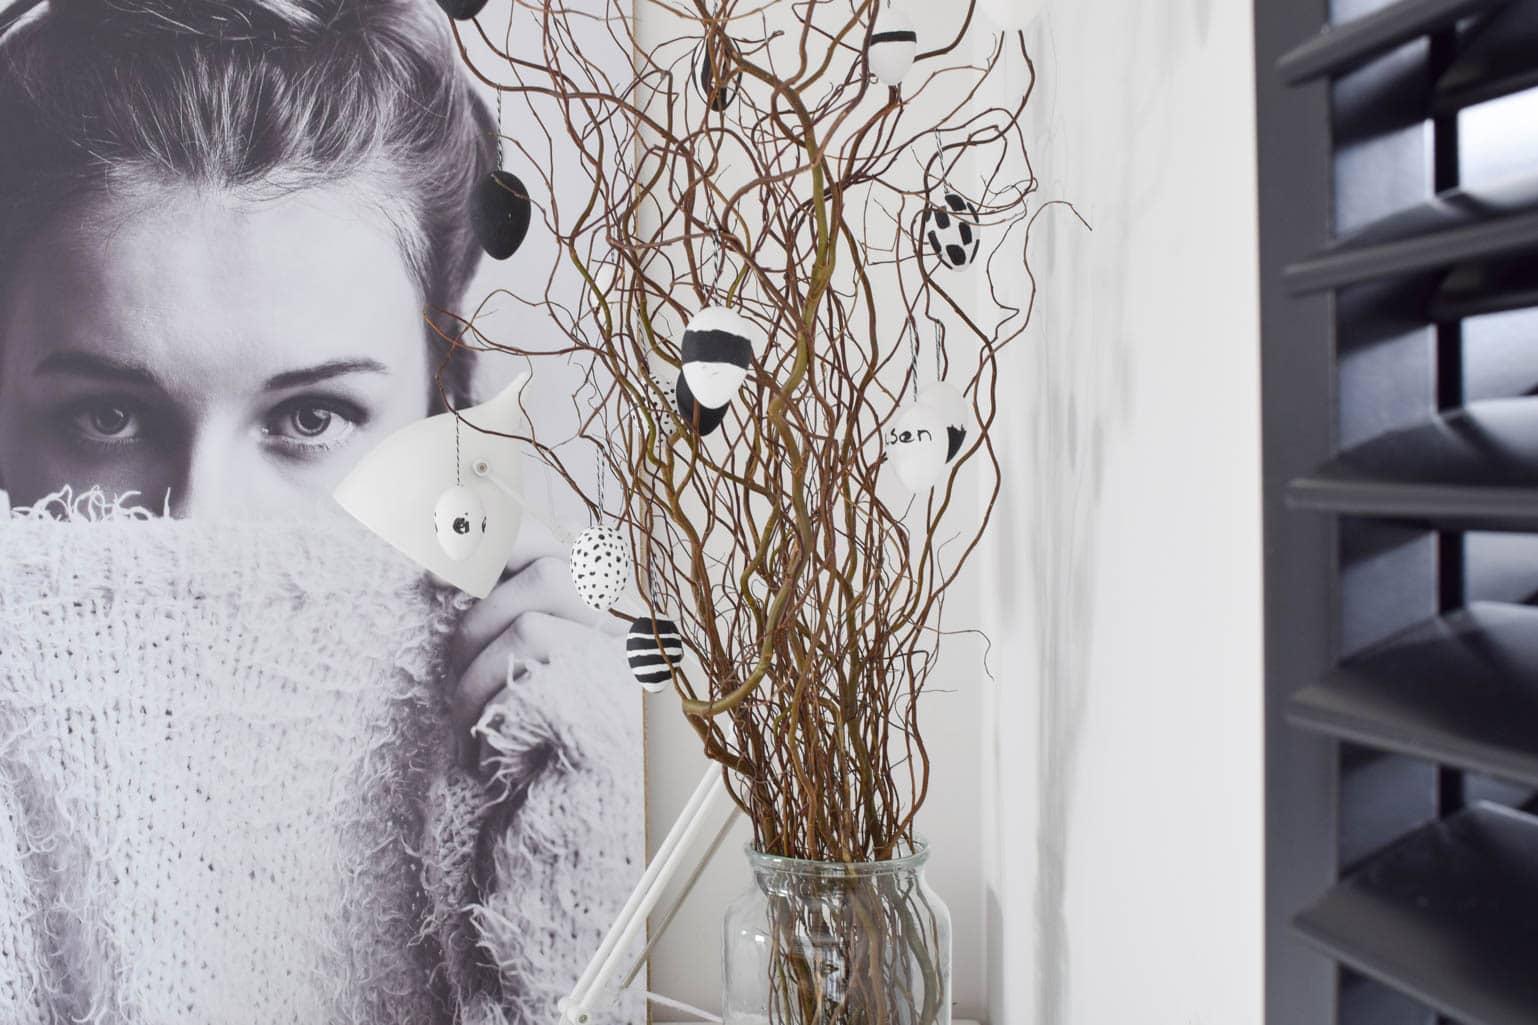 paaseieren schilderen in stijl - interiortwin